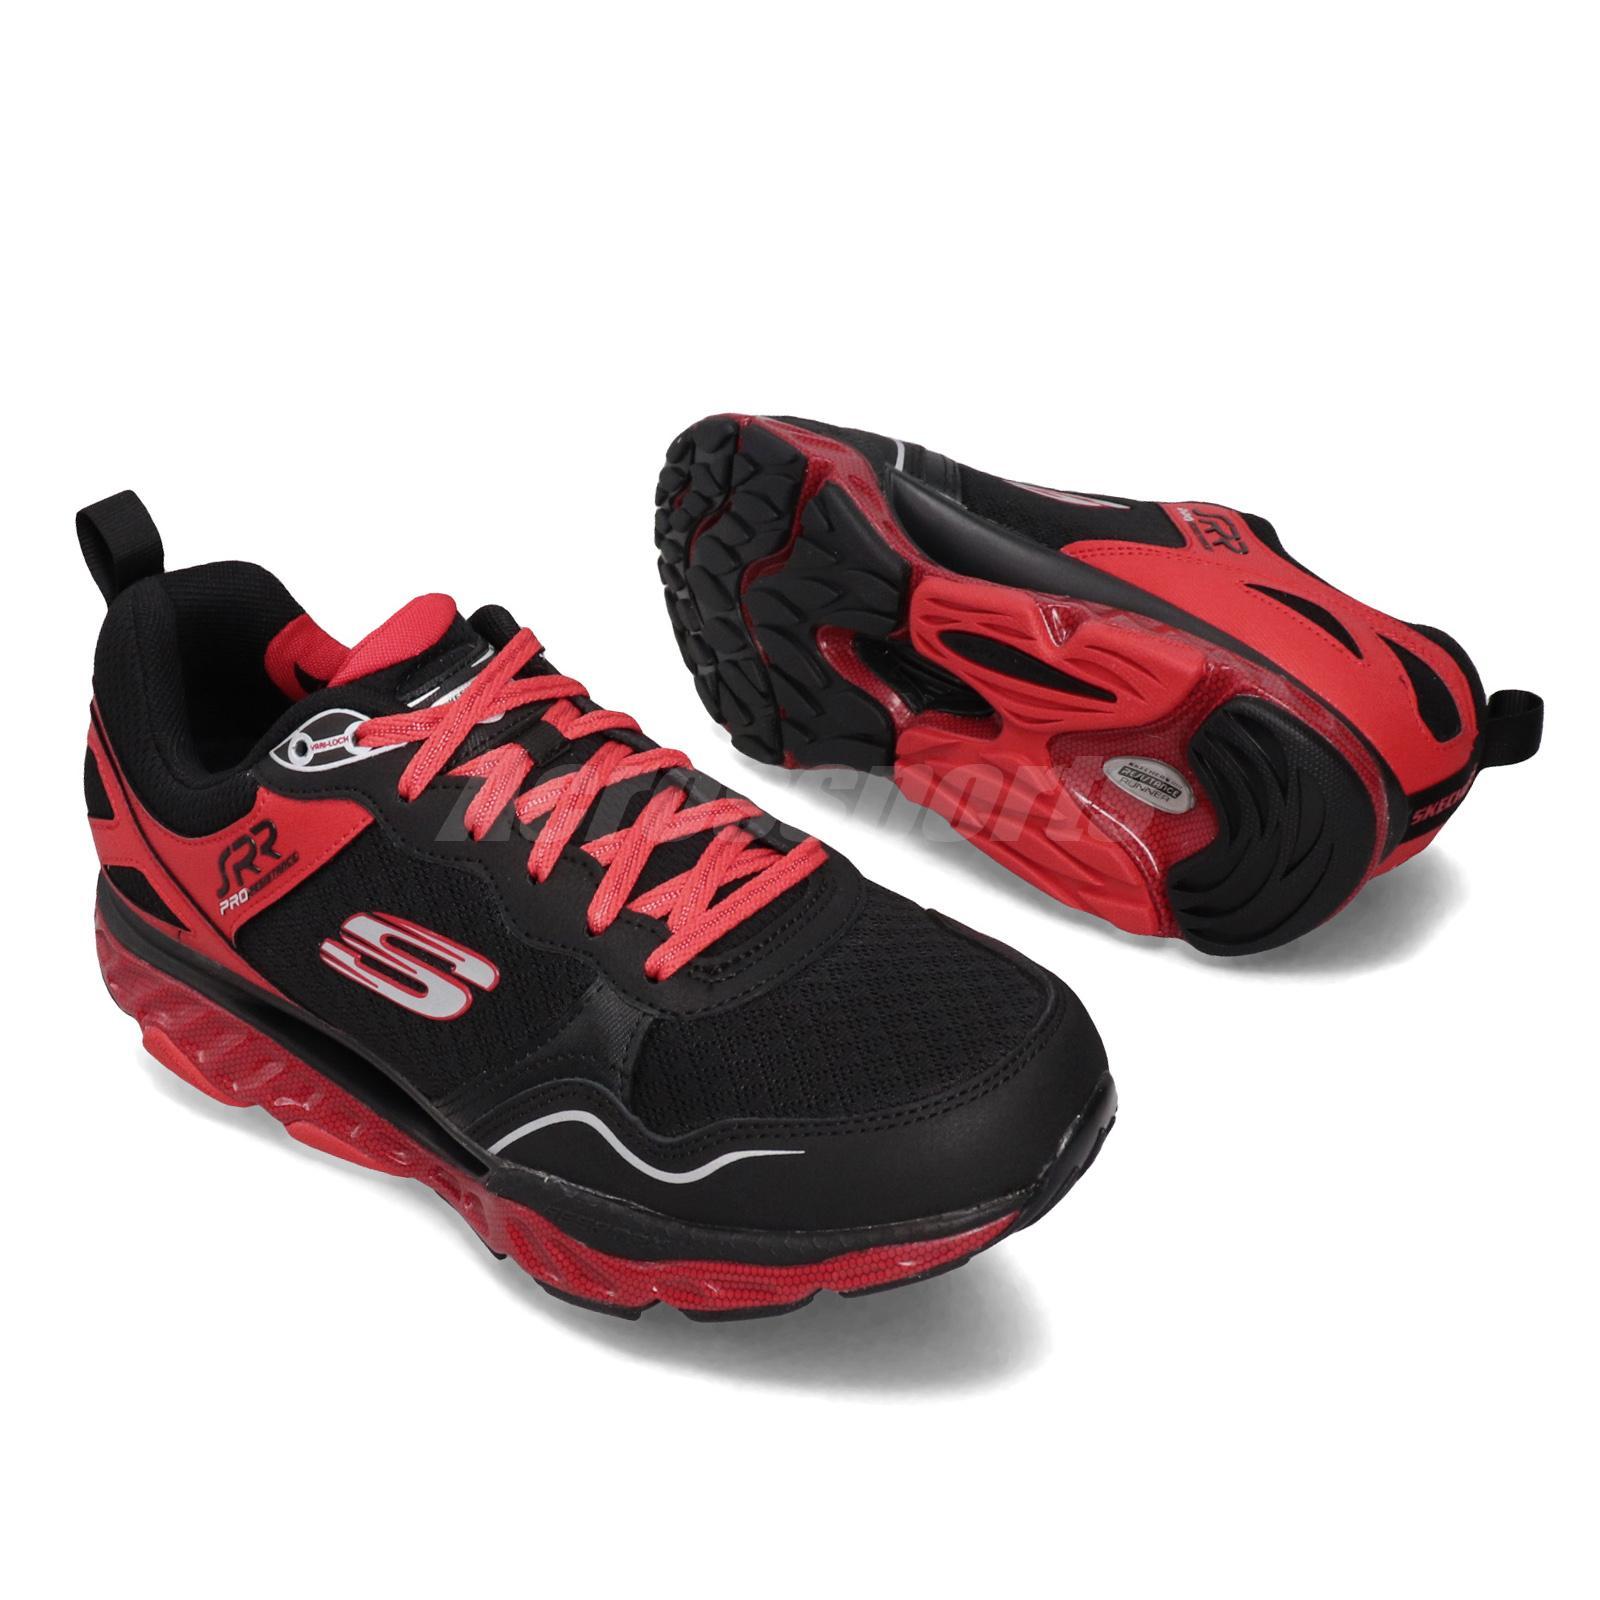 Skechers SRR Pro-Resistance-Runaway Black Red Men Running Shoes 999124-BKRD